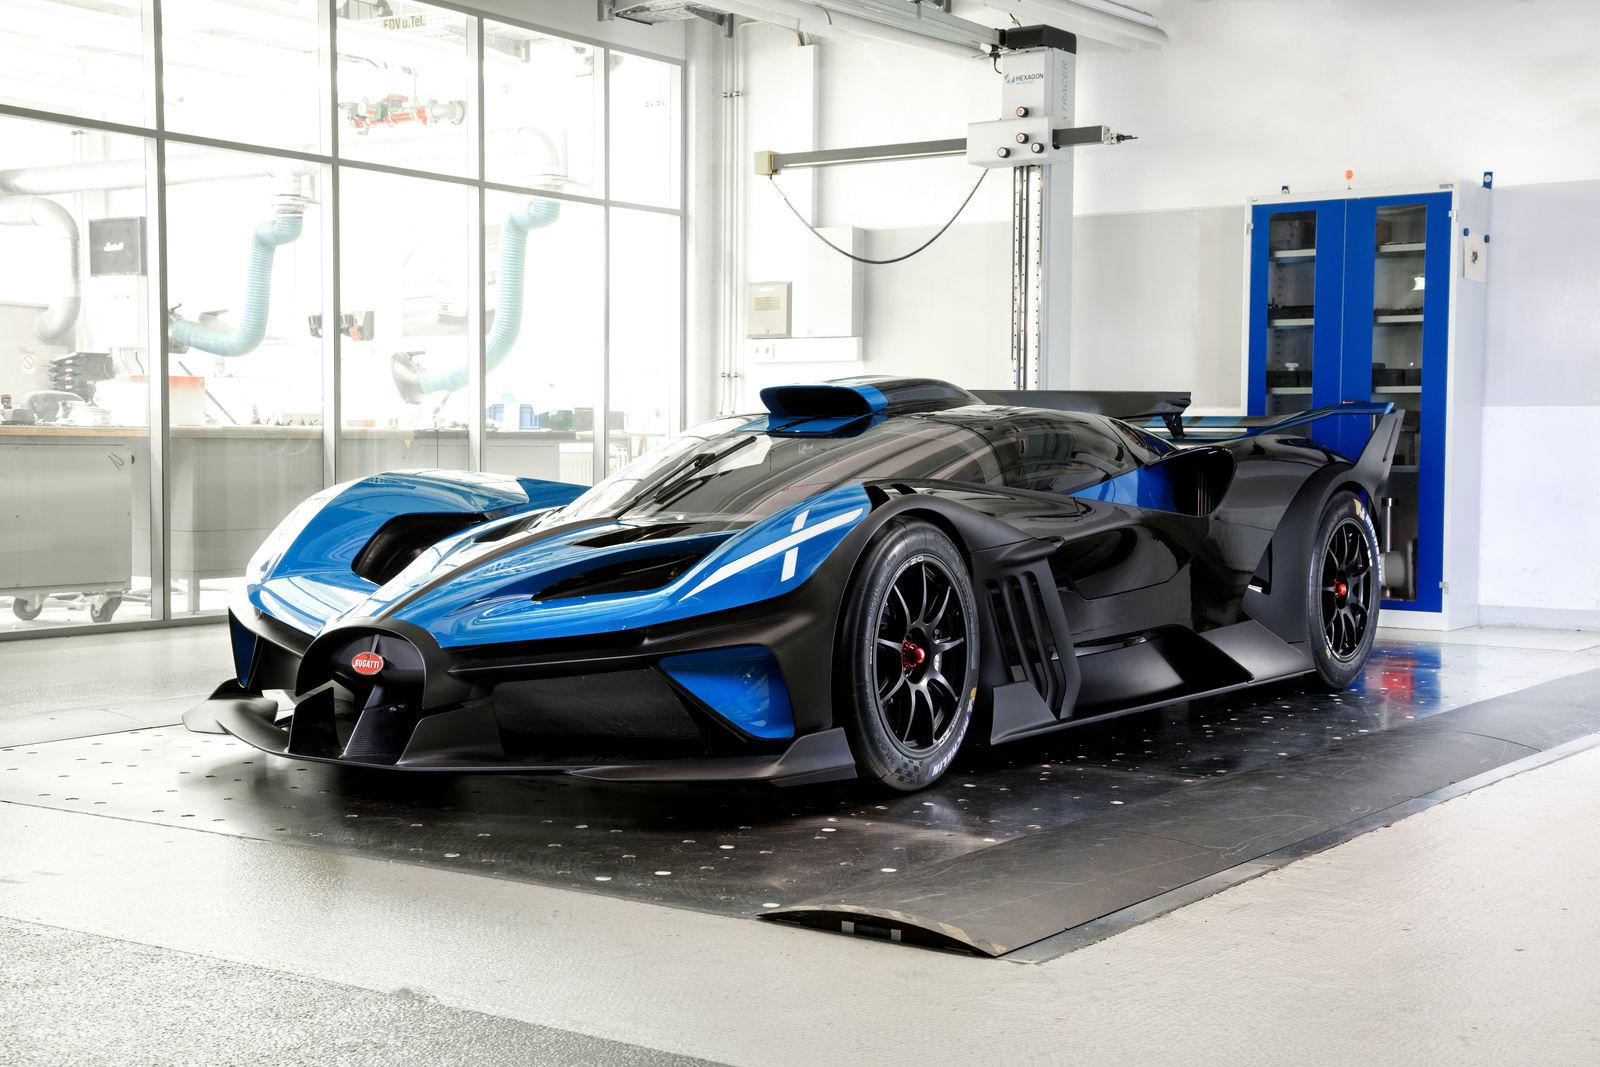 Bugatti-Bolide-concept-photos-28